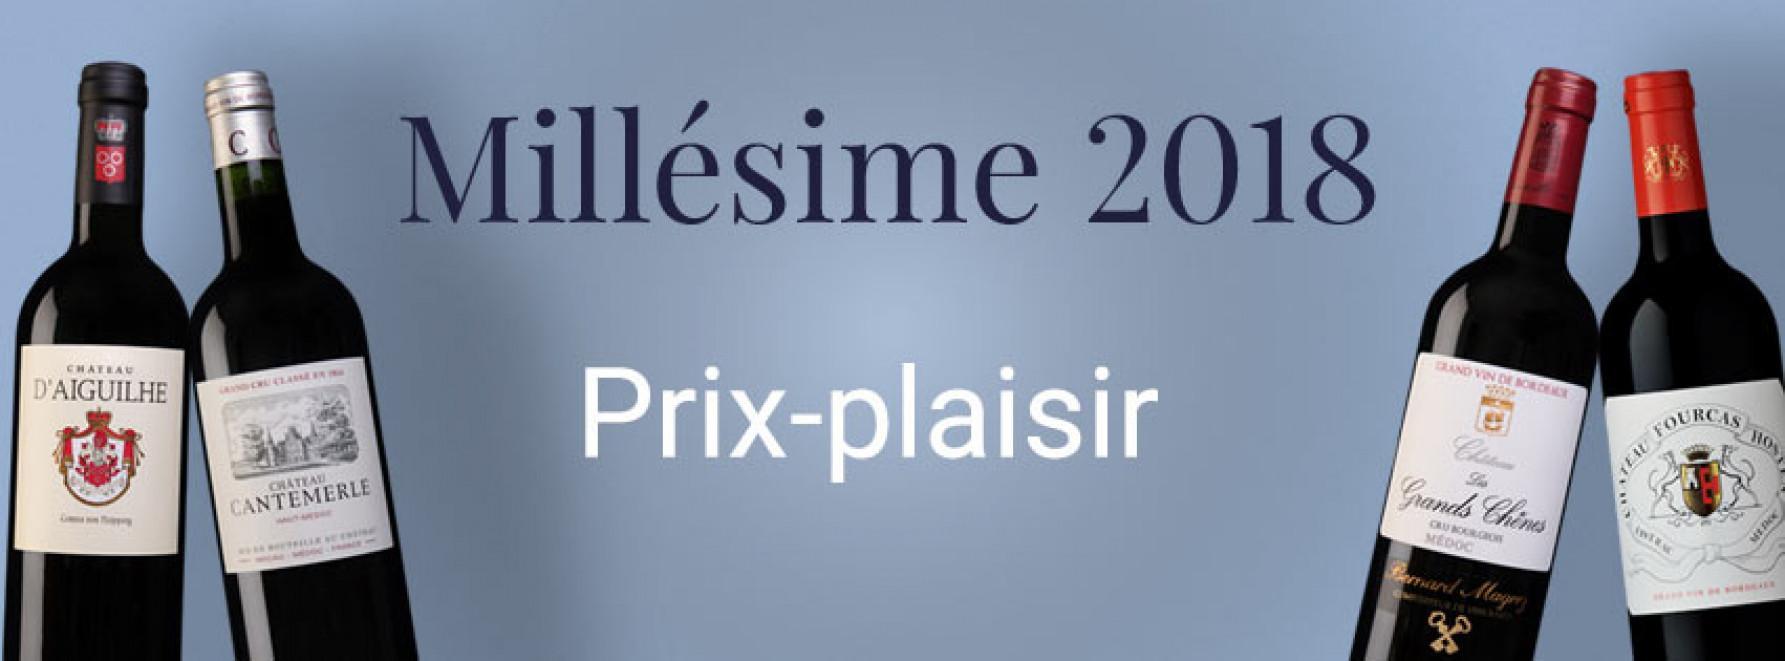 Millésime 2018 | Prix-plaisir